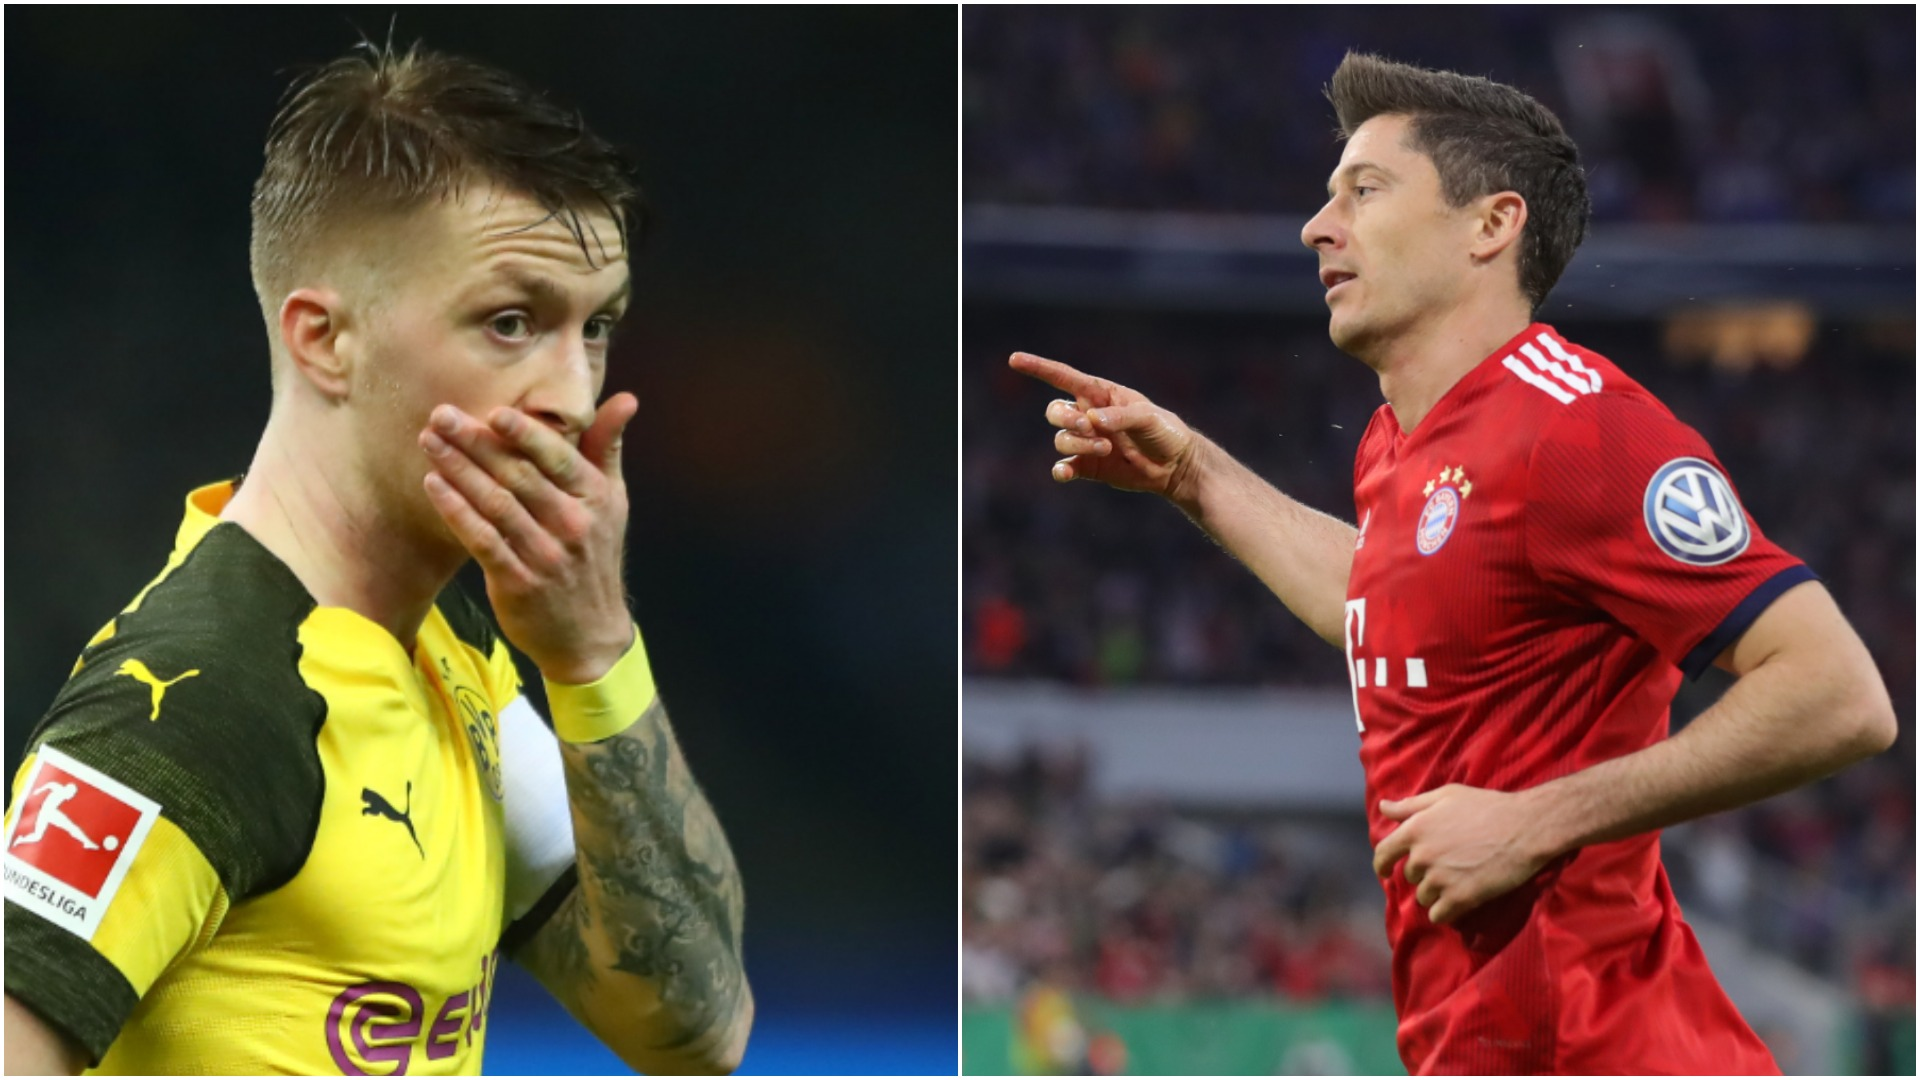 Bayern Munich v Borussia Dortmund: Neuer, Muller miss out on Der Klassiker combined XI